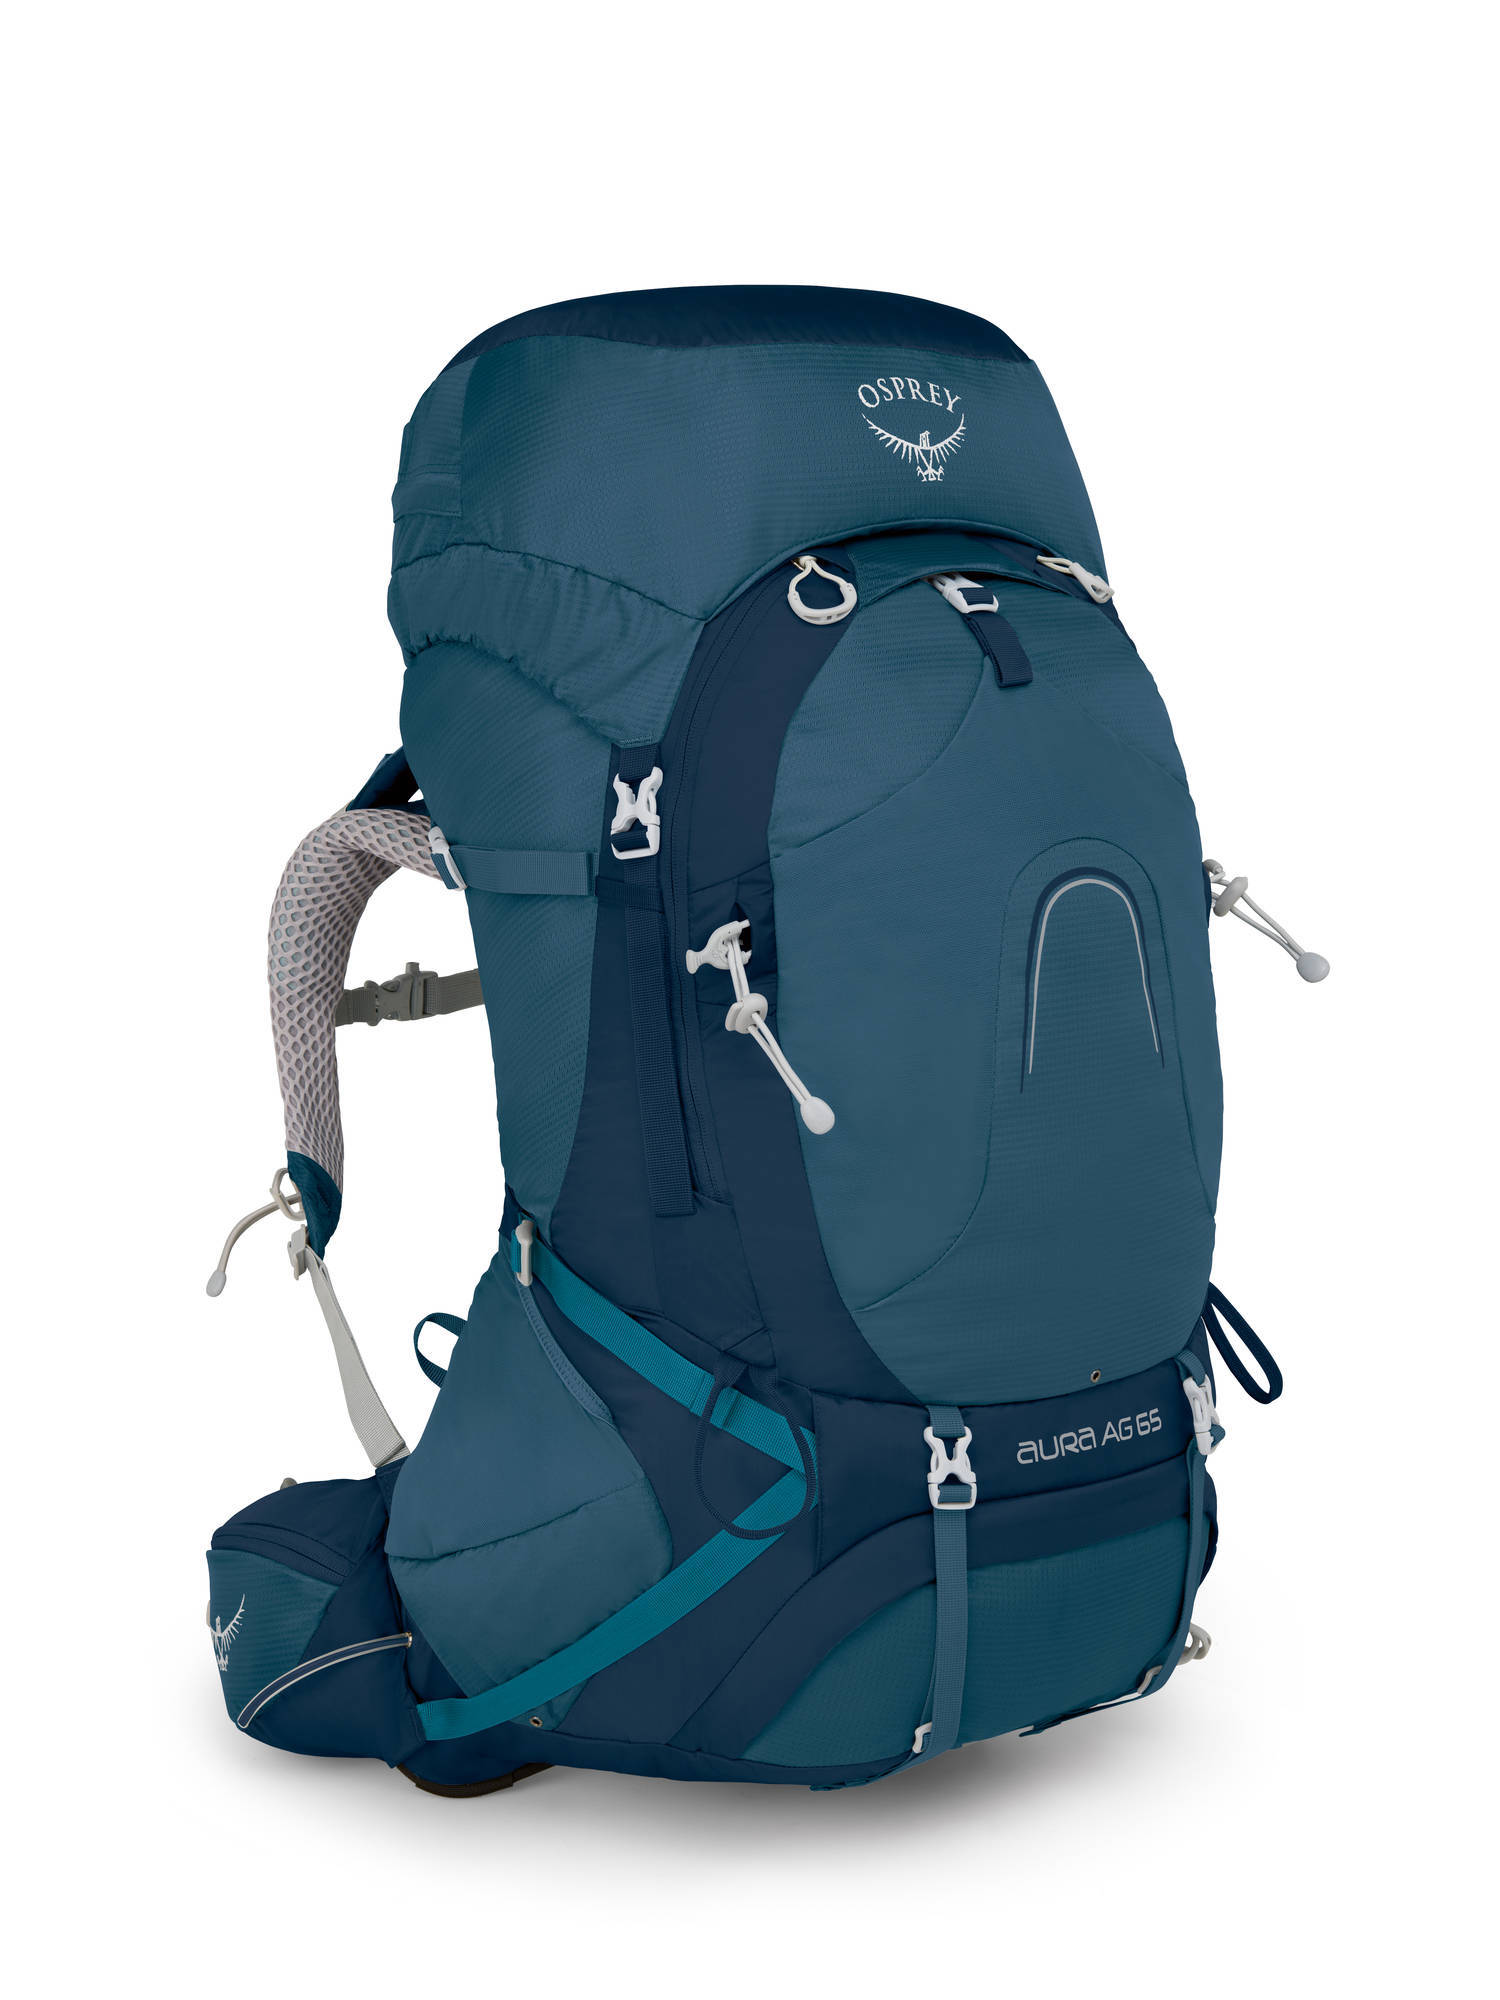 Рюкзак женский Osprey Aura AG 65 WM Women Challenger Blue, 1043160.126, Женские рюкзаки - арт. 1032770288